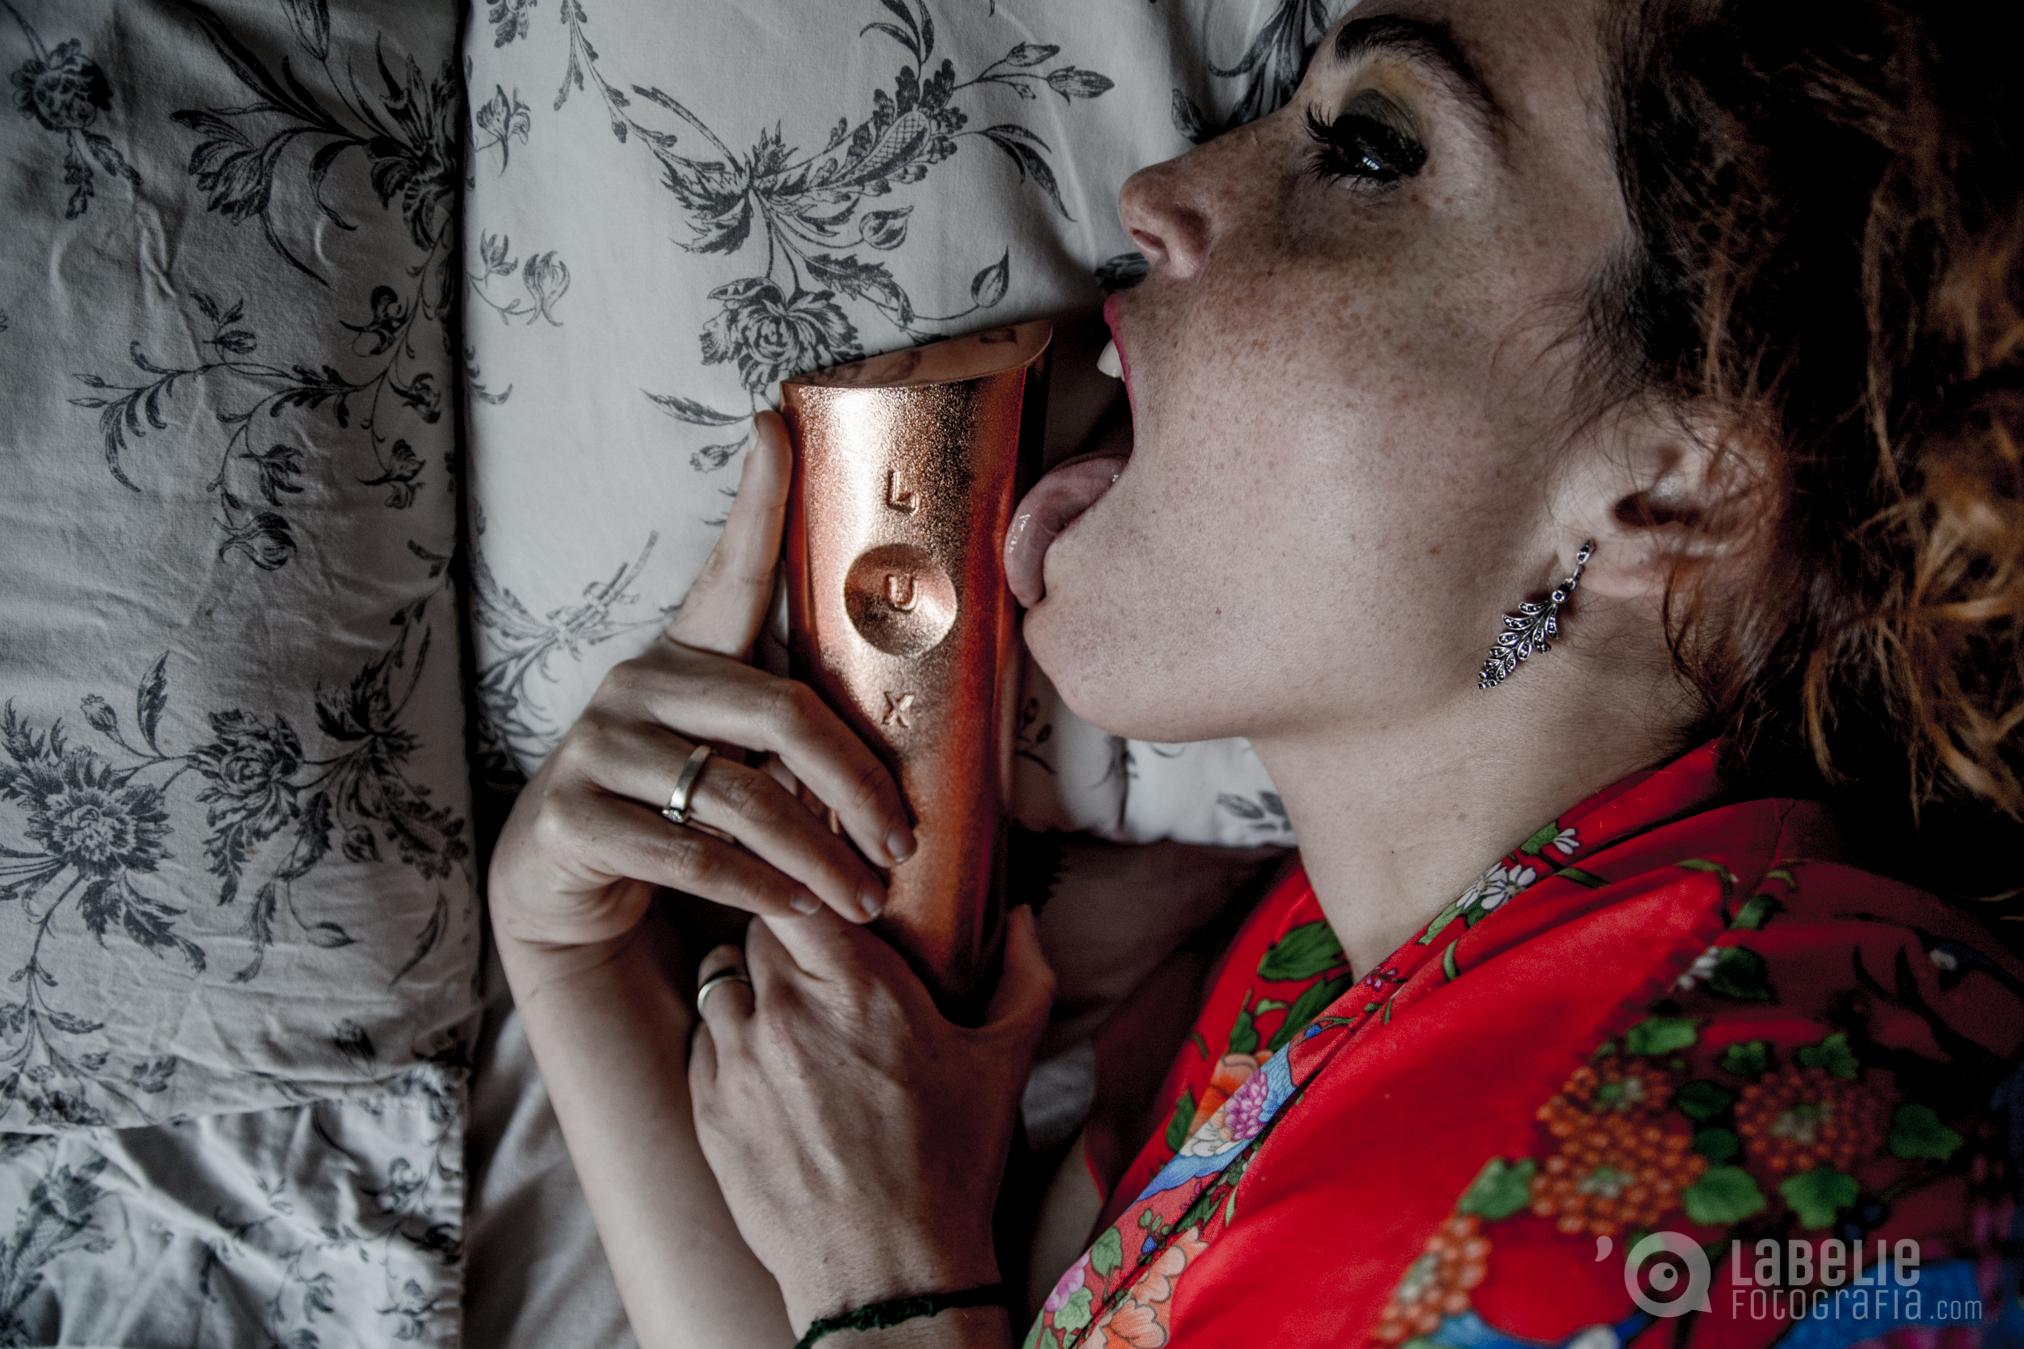 Premios LUX :: La Cristina fotografia :: Premios LUX 2013 :: Fotografía Social :: Fotografía de Bebés :: Fotográfo de Bodas Barcelona